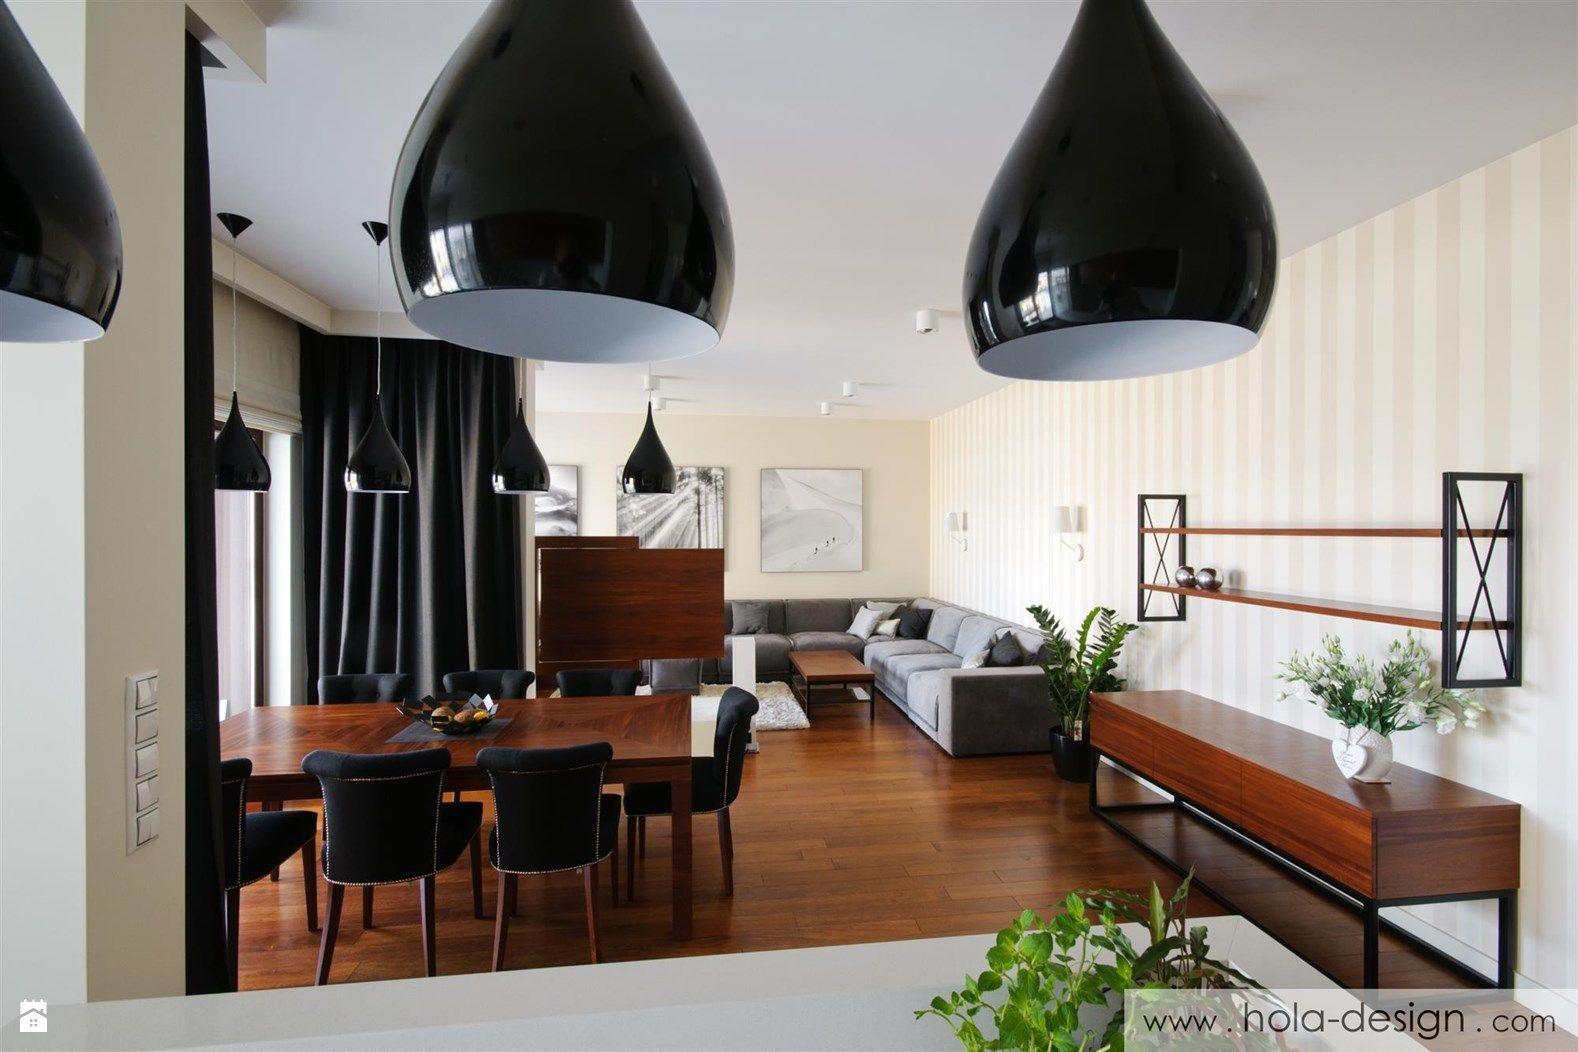 Otwarta kuchnia w bieli hola design homesquare - Salon Styl Klasyczny Zdj Cie Od Hola Design Salon Styl Klasyczny Hola Design